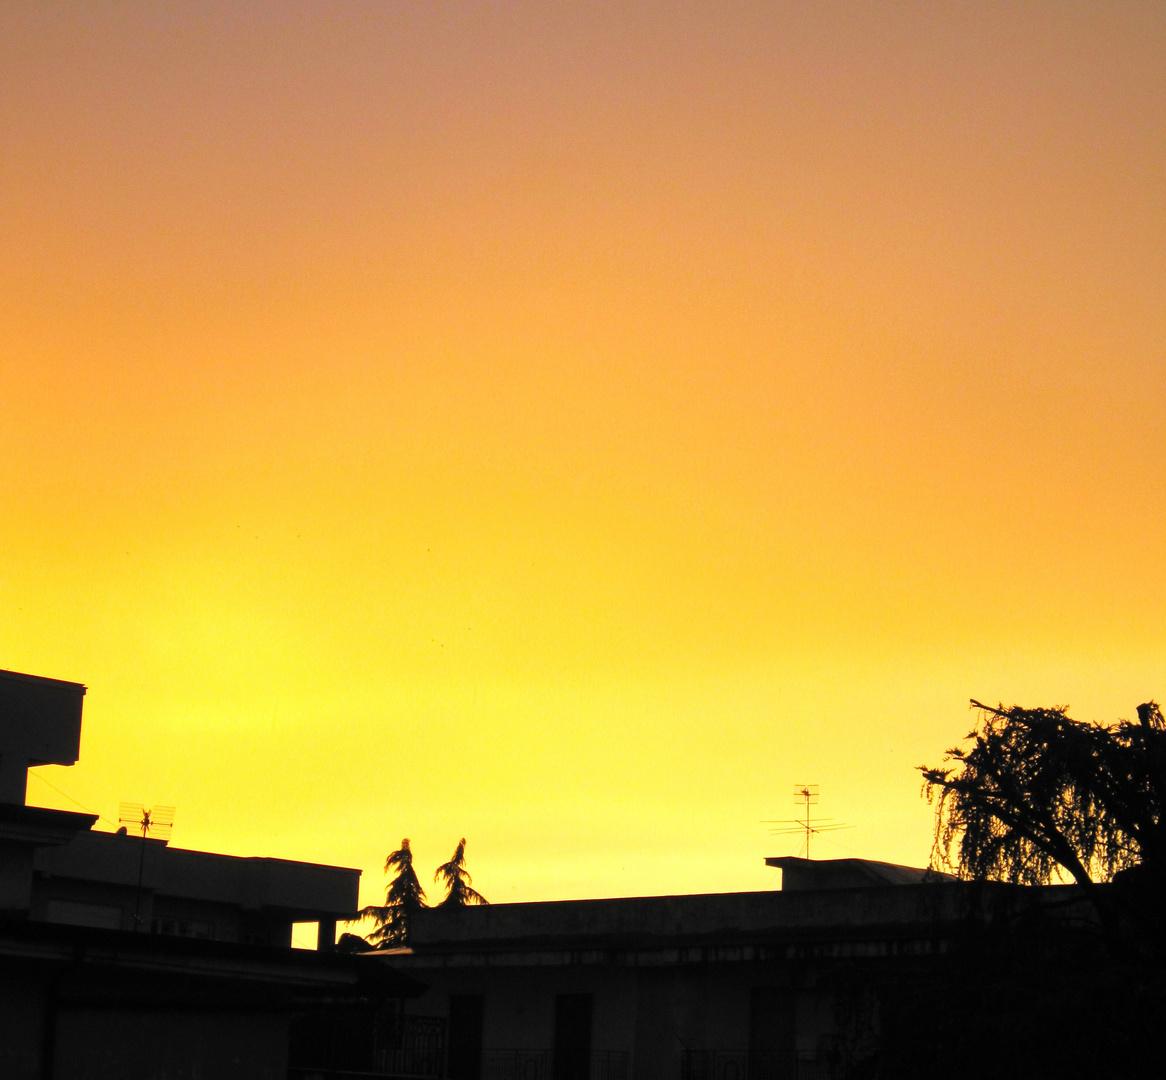 Il giallo